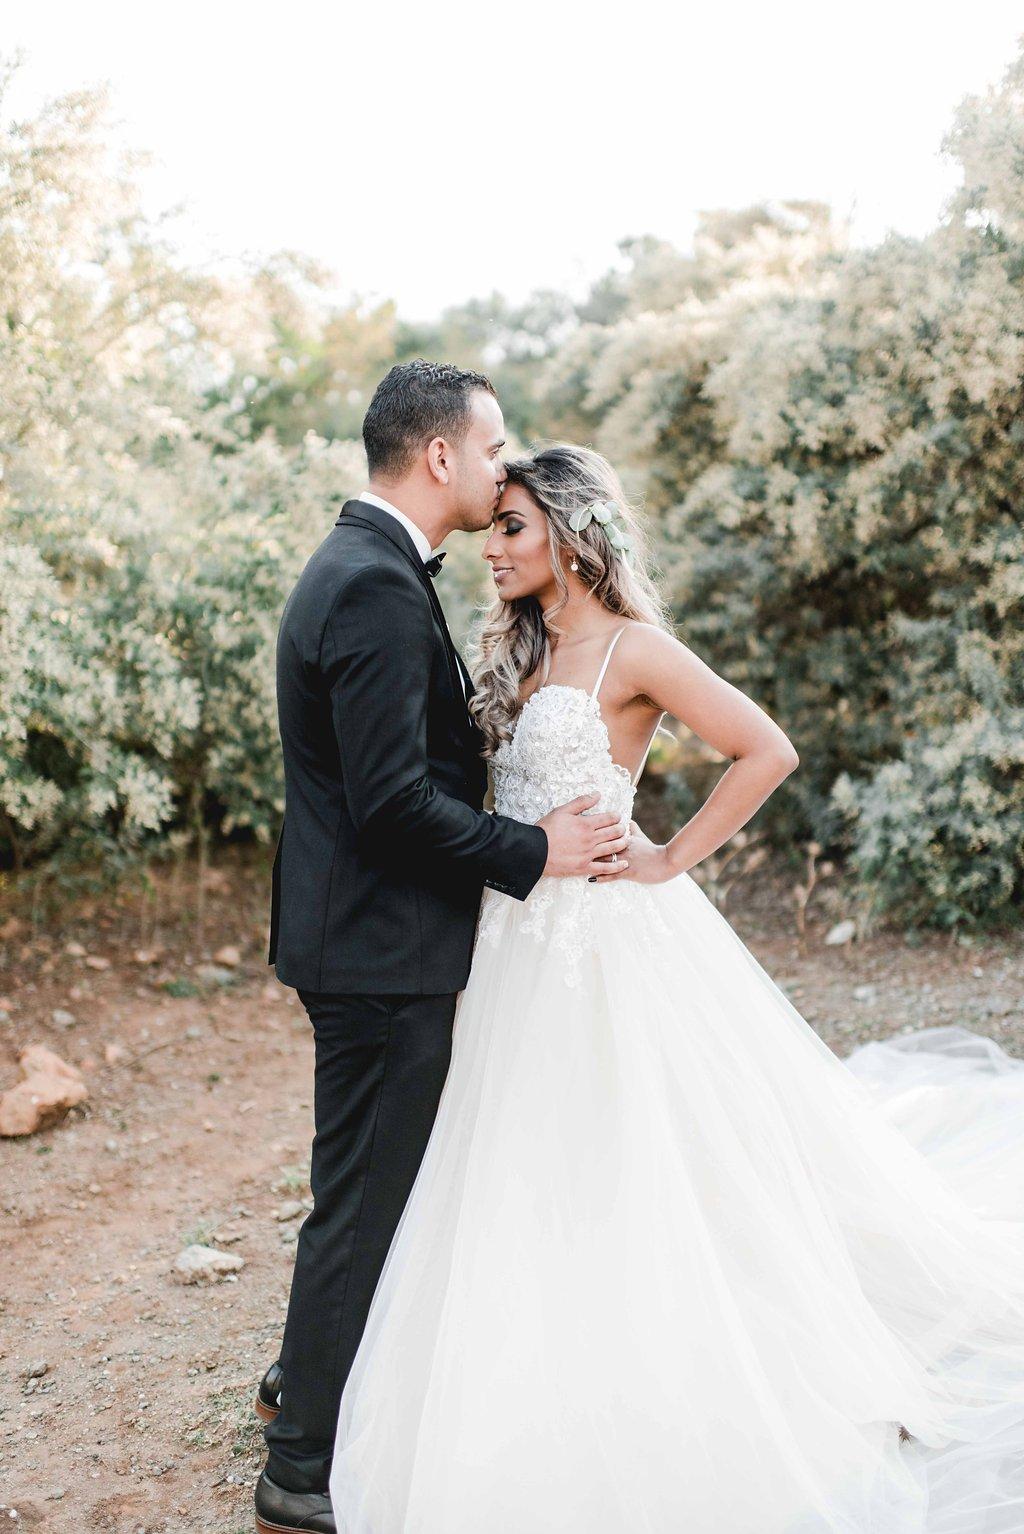 Bride and Groom | Image: Carla Adel